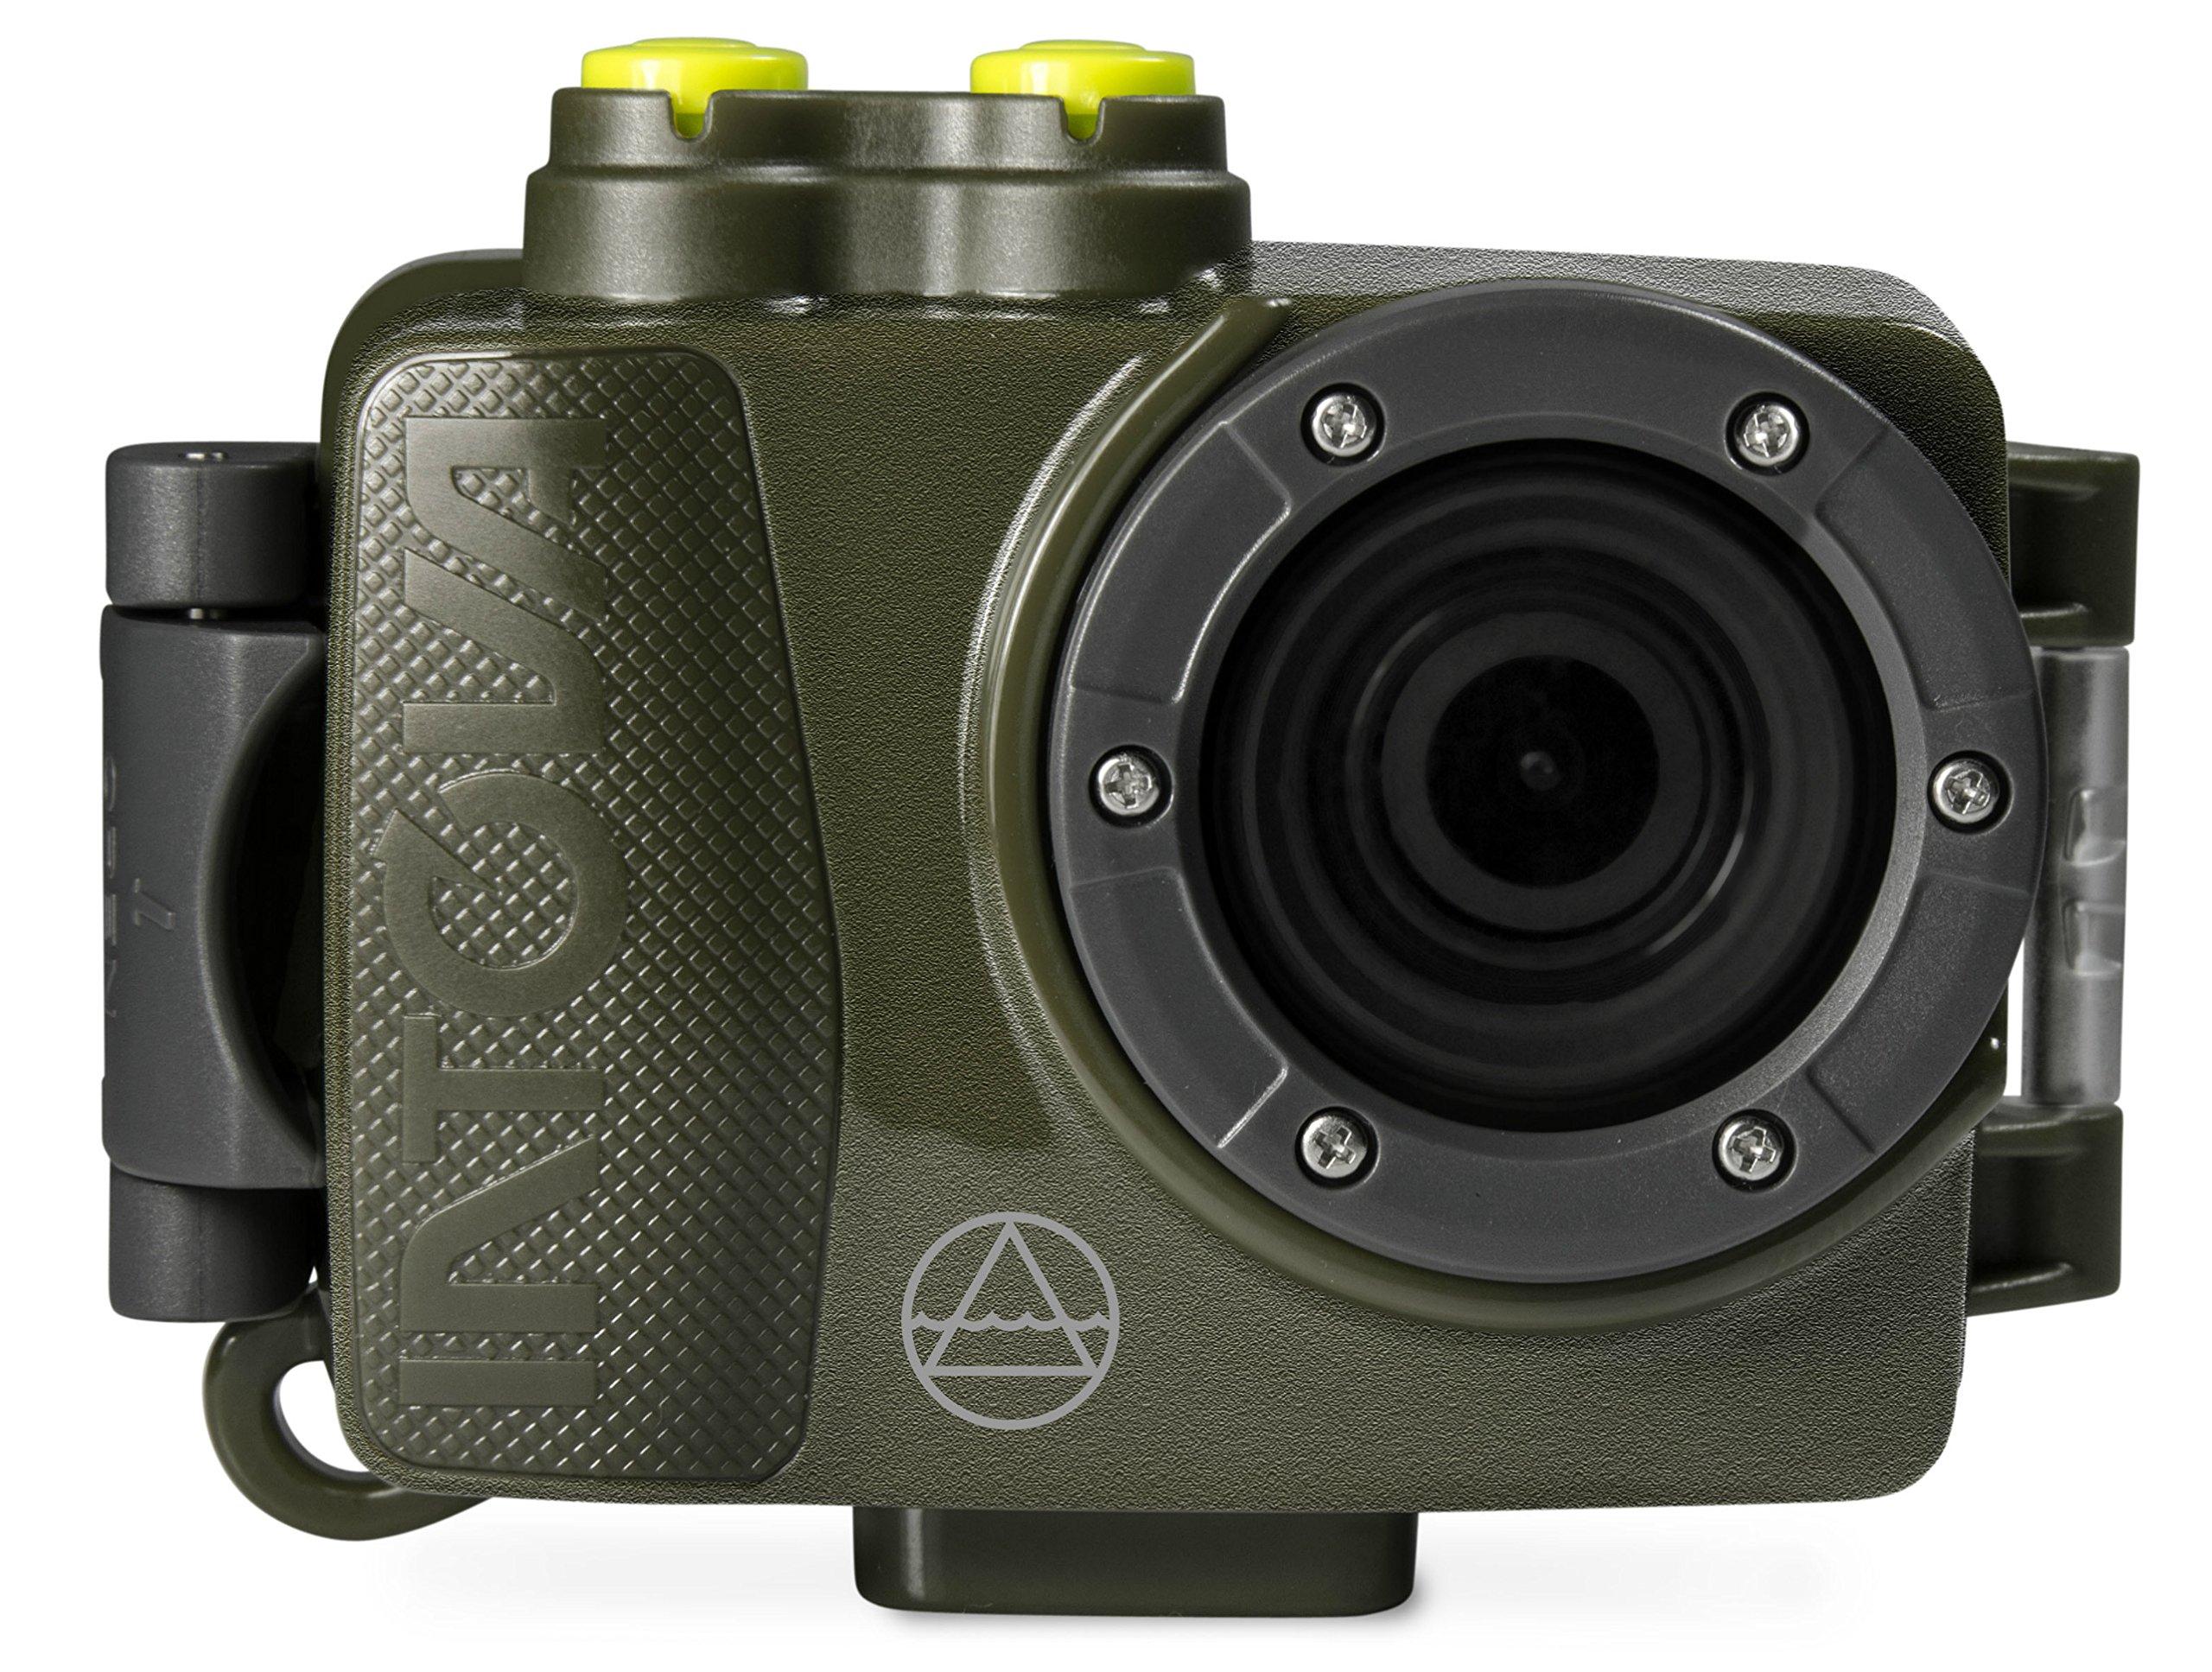 Intova DUB Waterproof Hi-Res 8MP/1080p Photo and Video Action Camera, Green by Intova